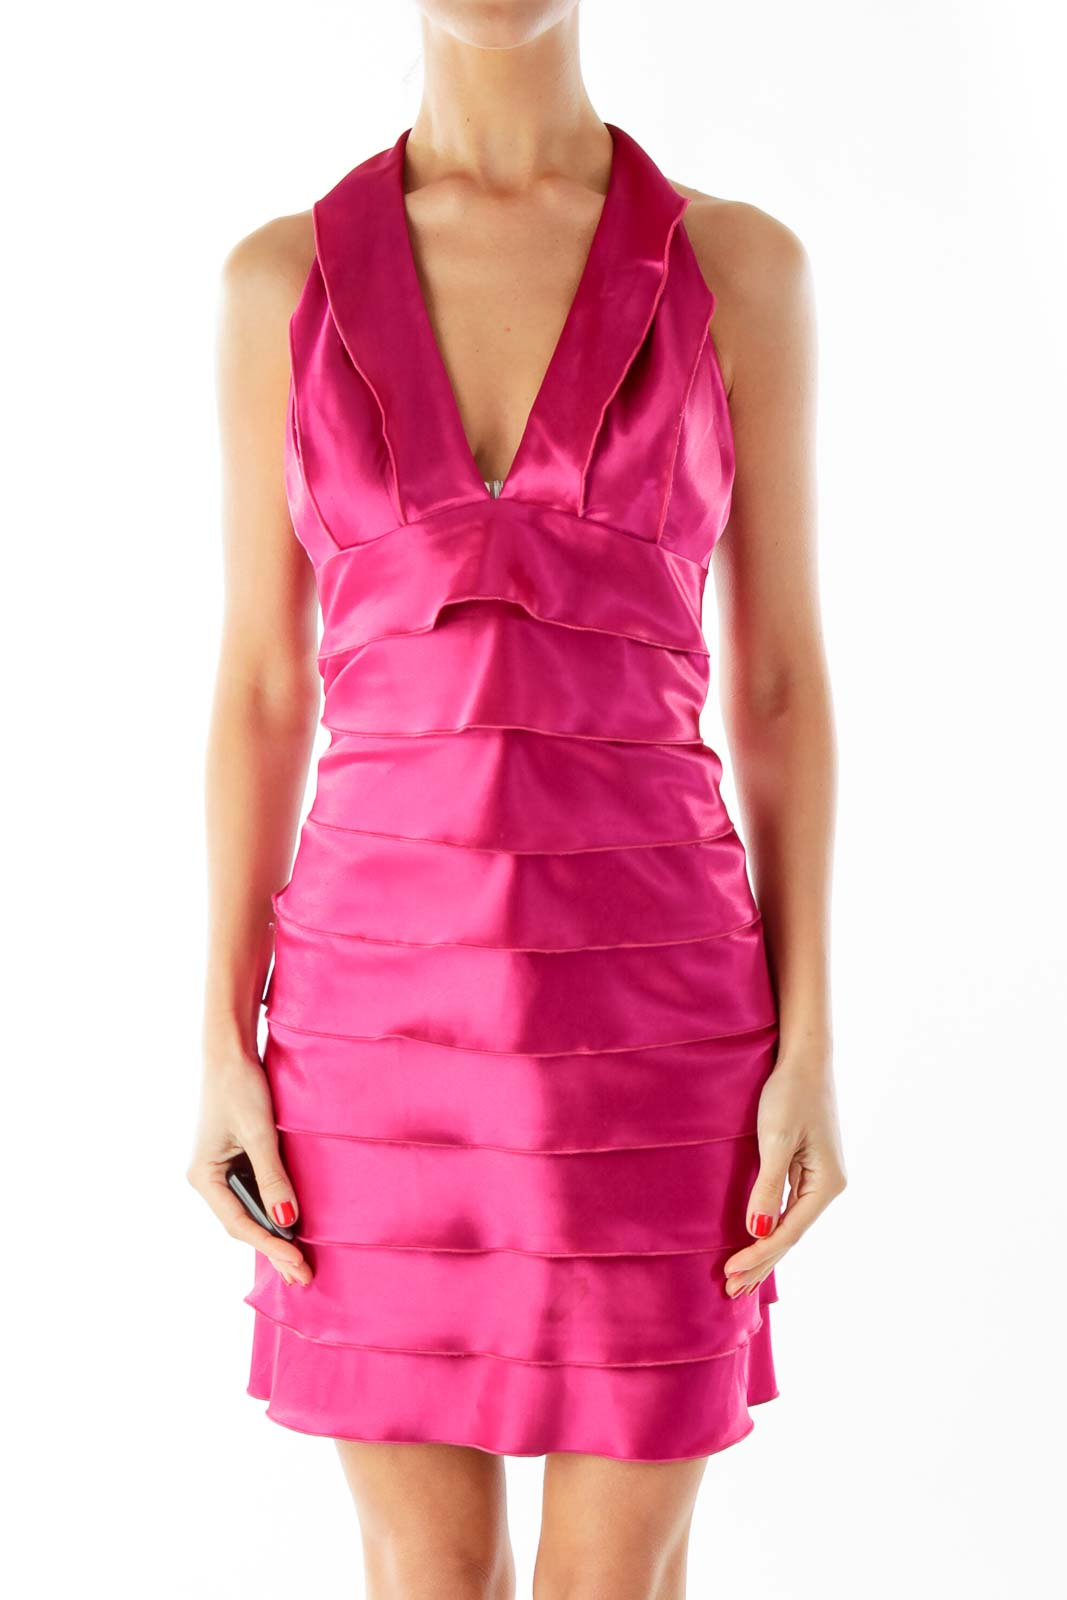 Magenta Halter Dress Front